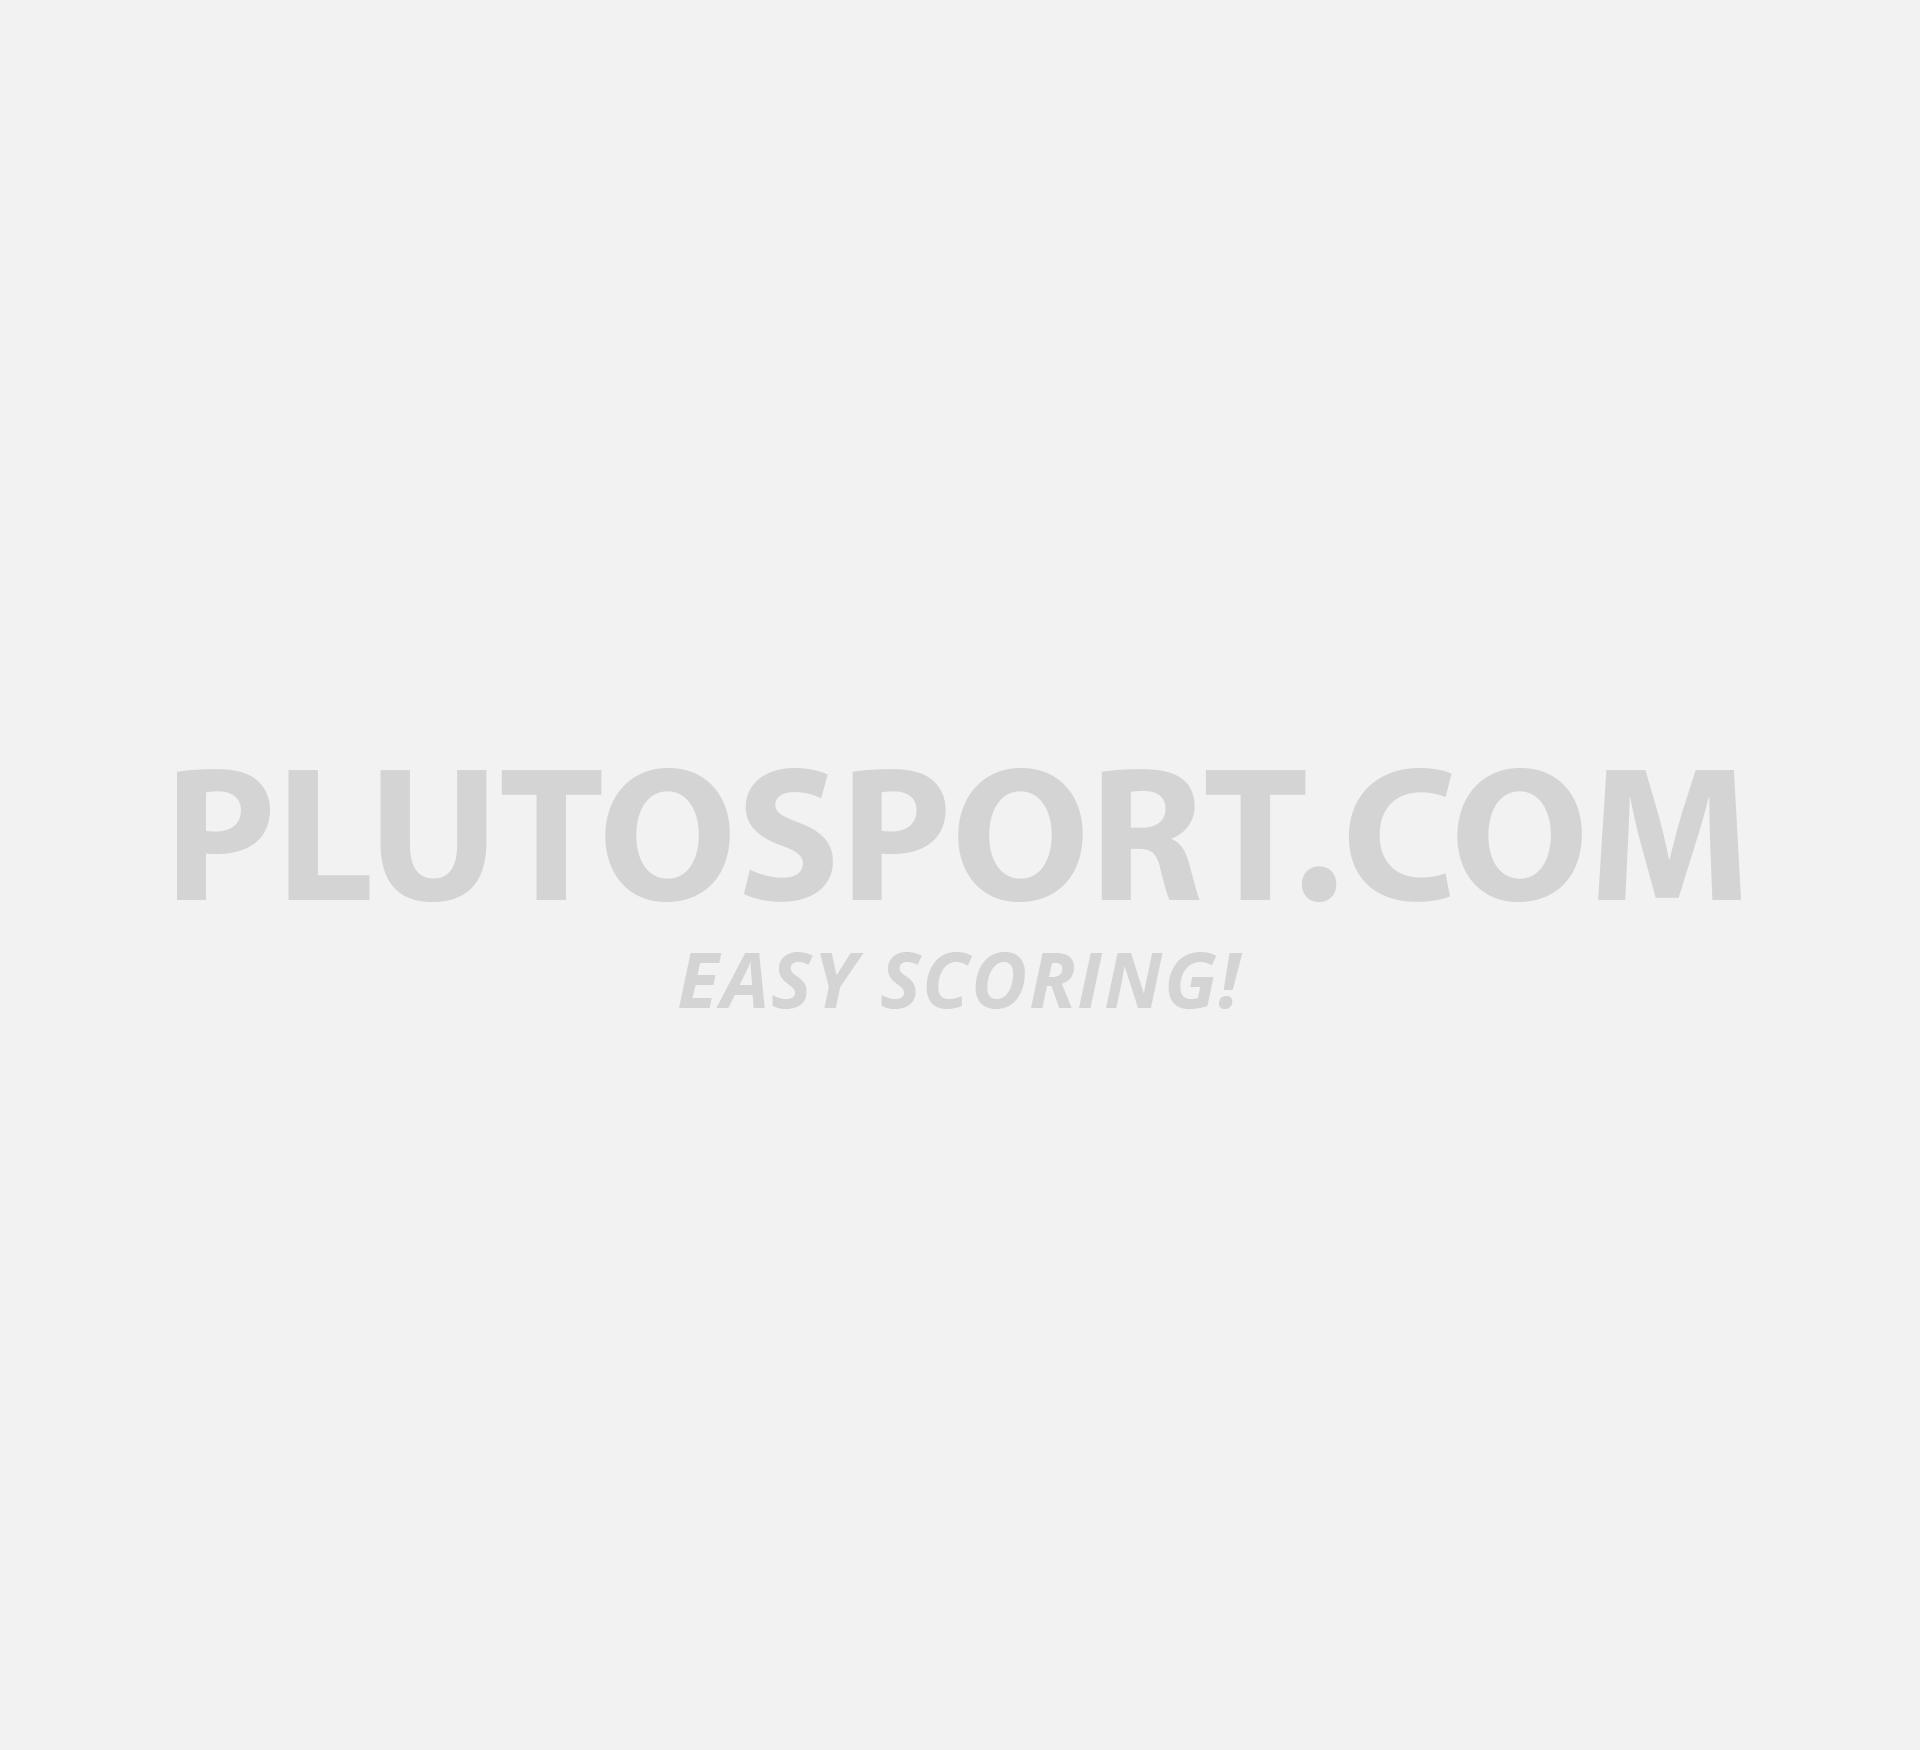 Adidas Pureboost Running Shoes Women